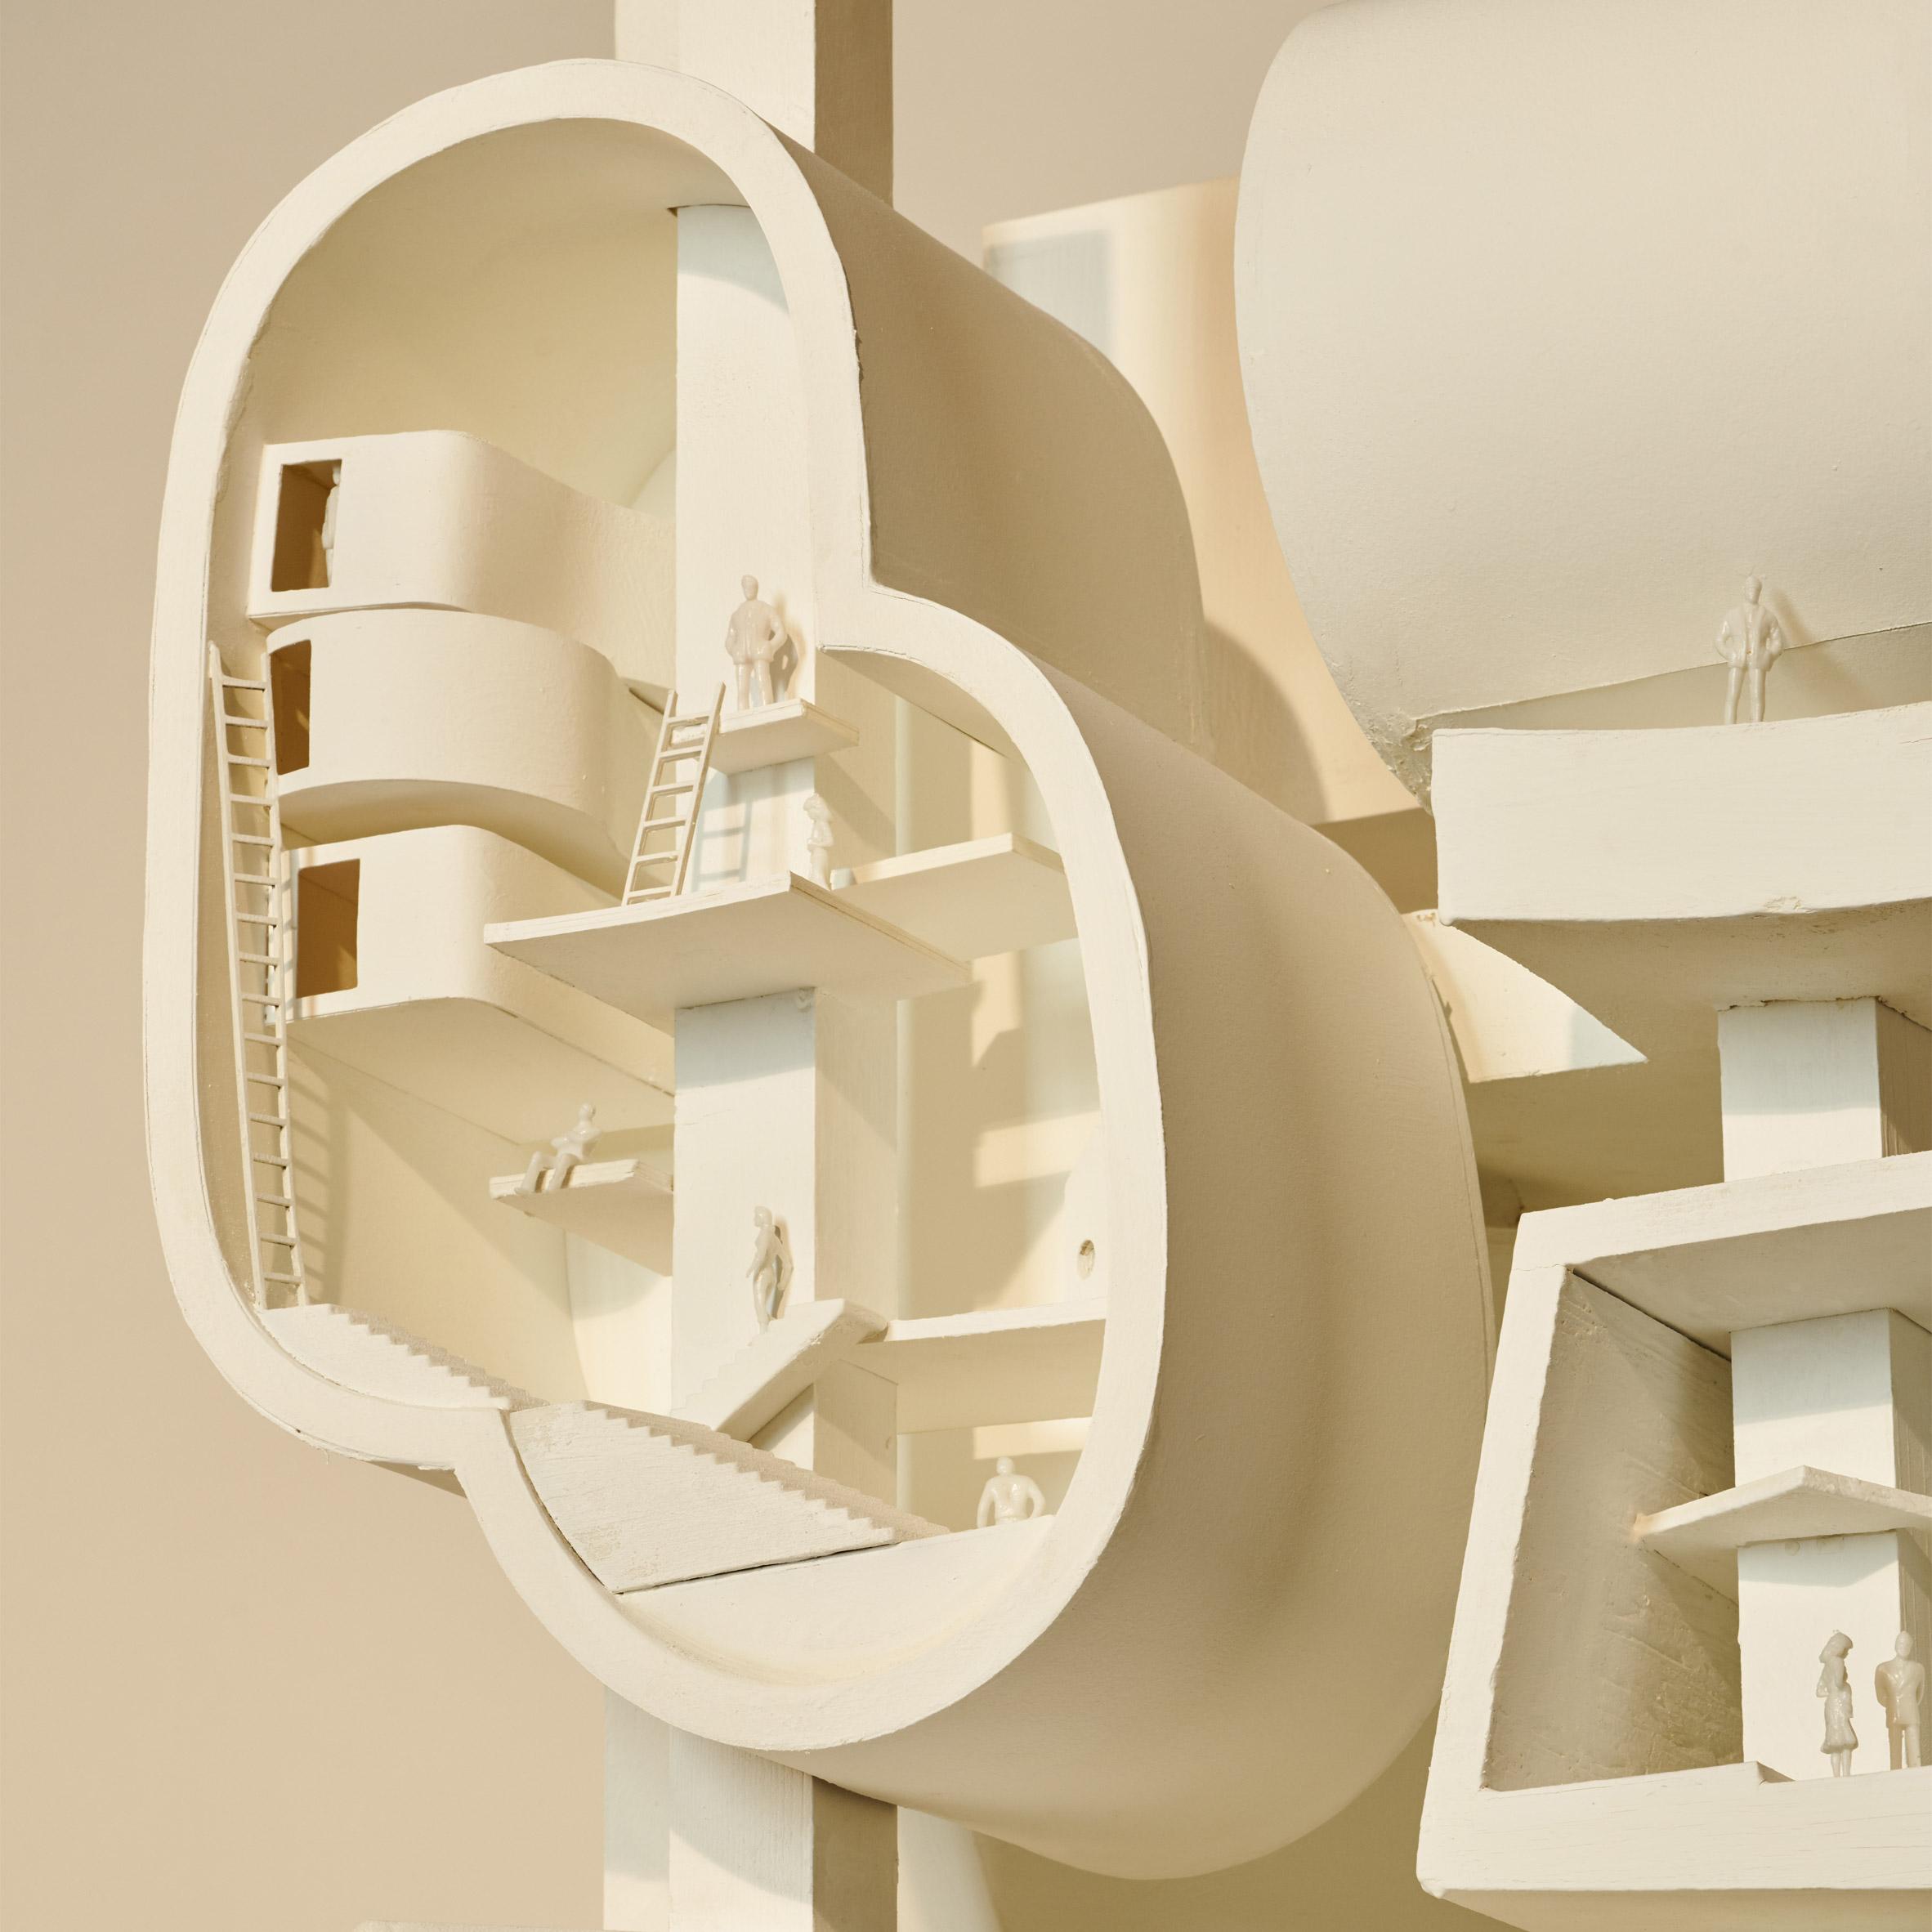 bureau spectacular shows fantastical architectural models at sfmoma - Bureau Design